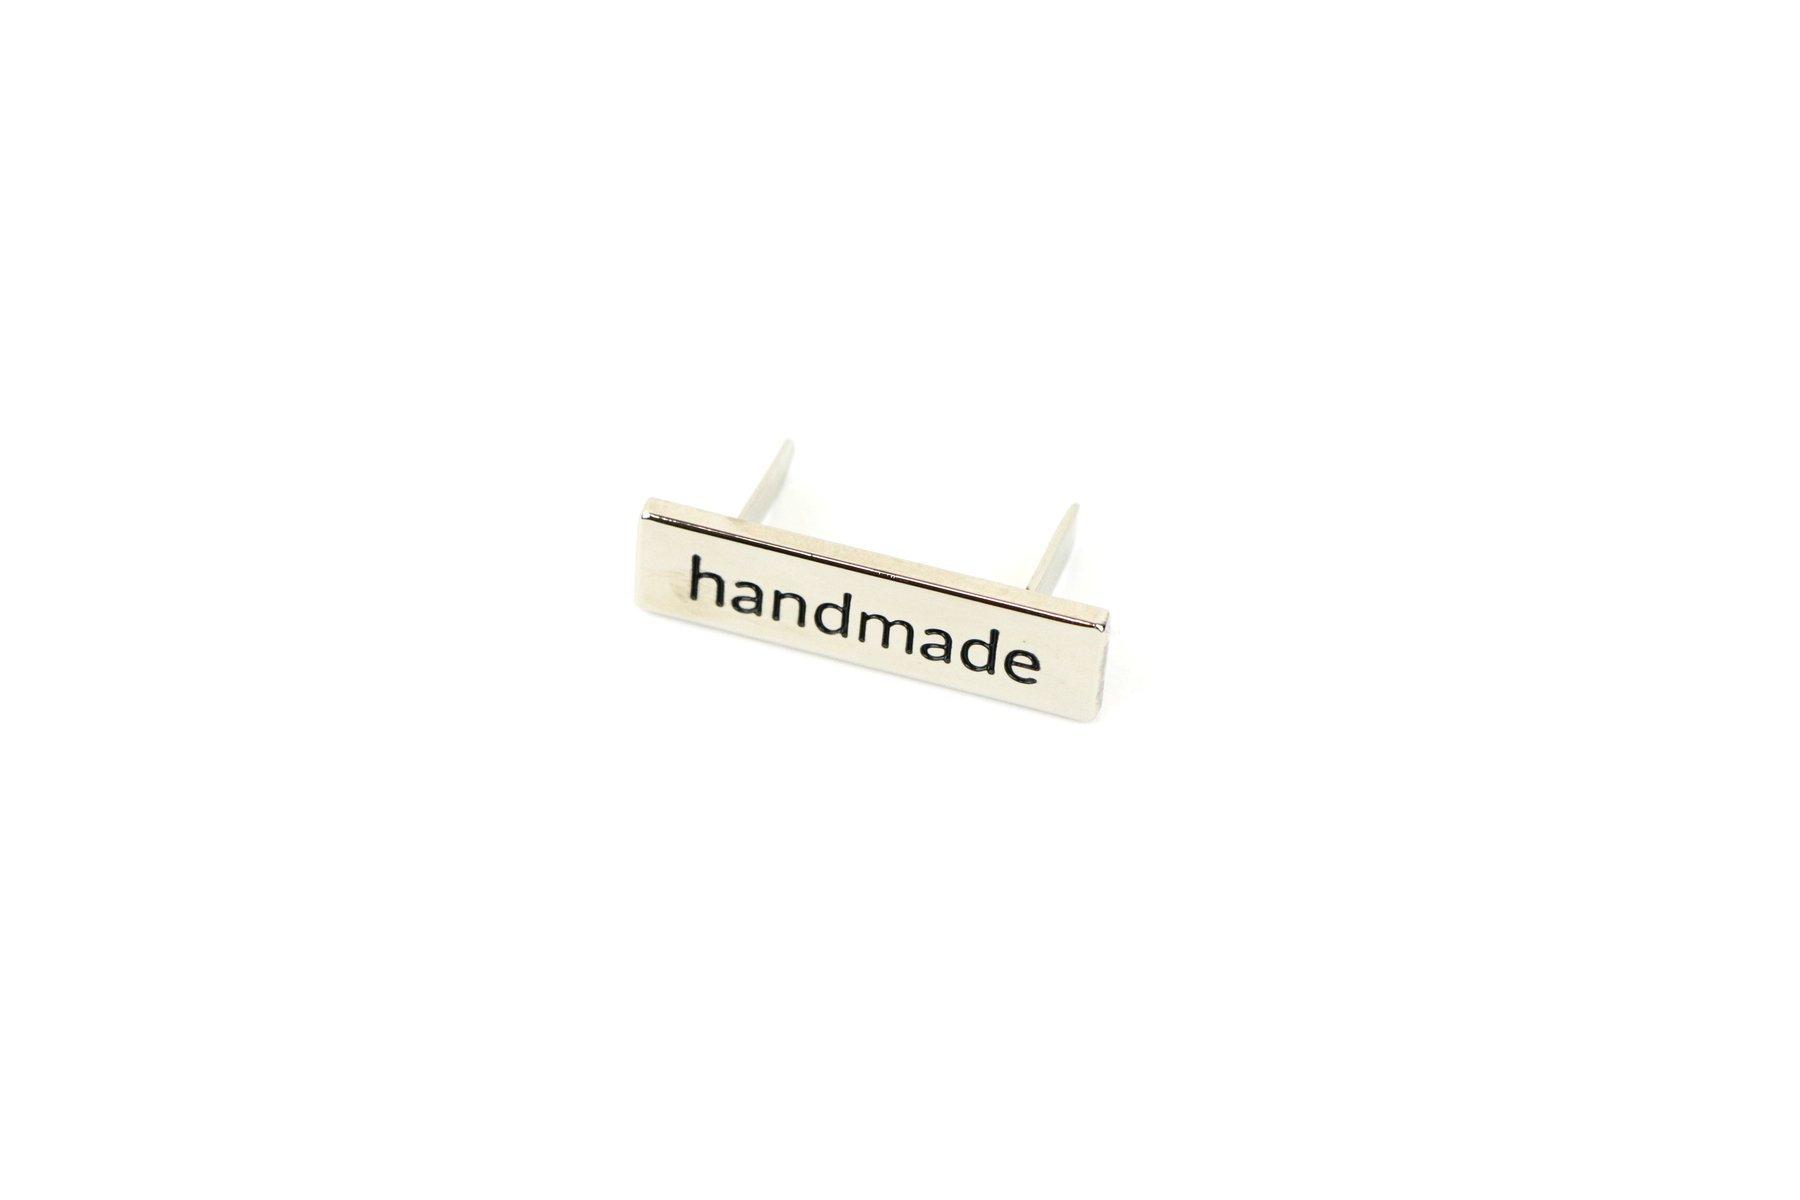 Sans Serif Handmade Label